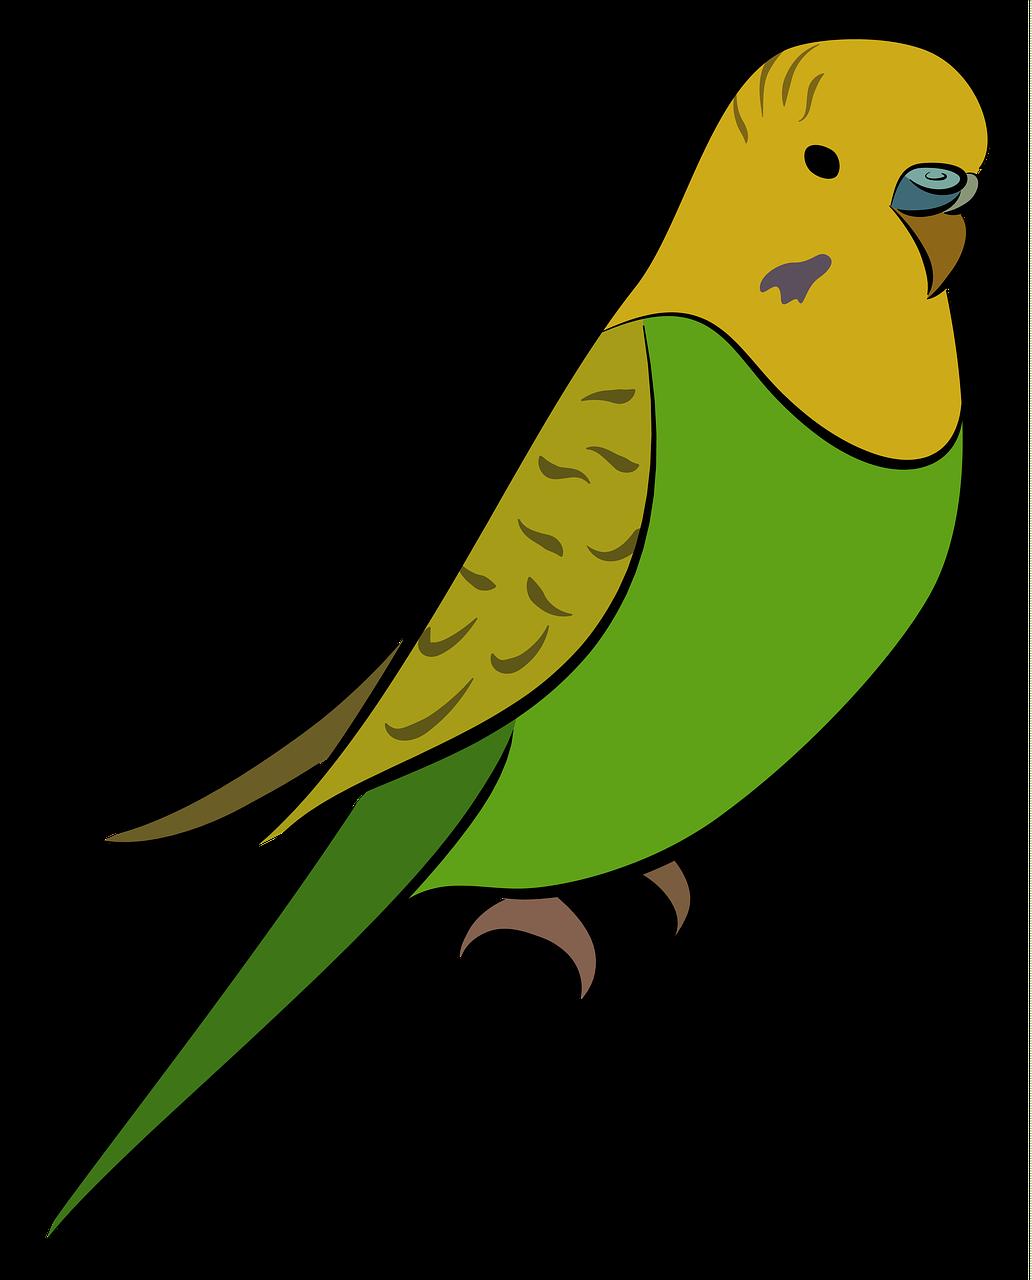 Budgie Parakeet Bird Pet Yellow Free Image From Needpix Com